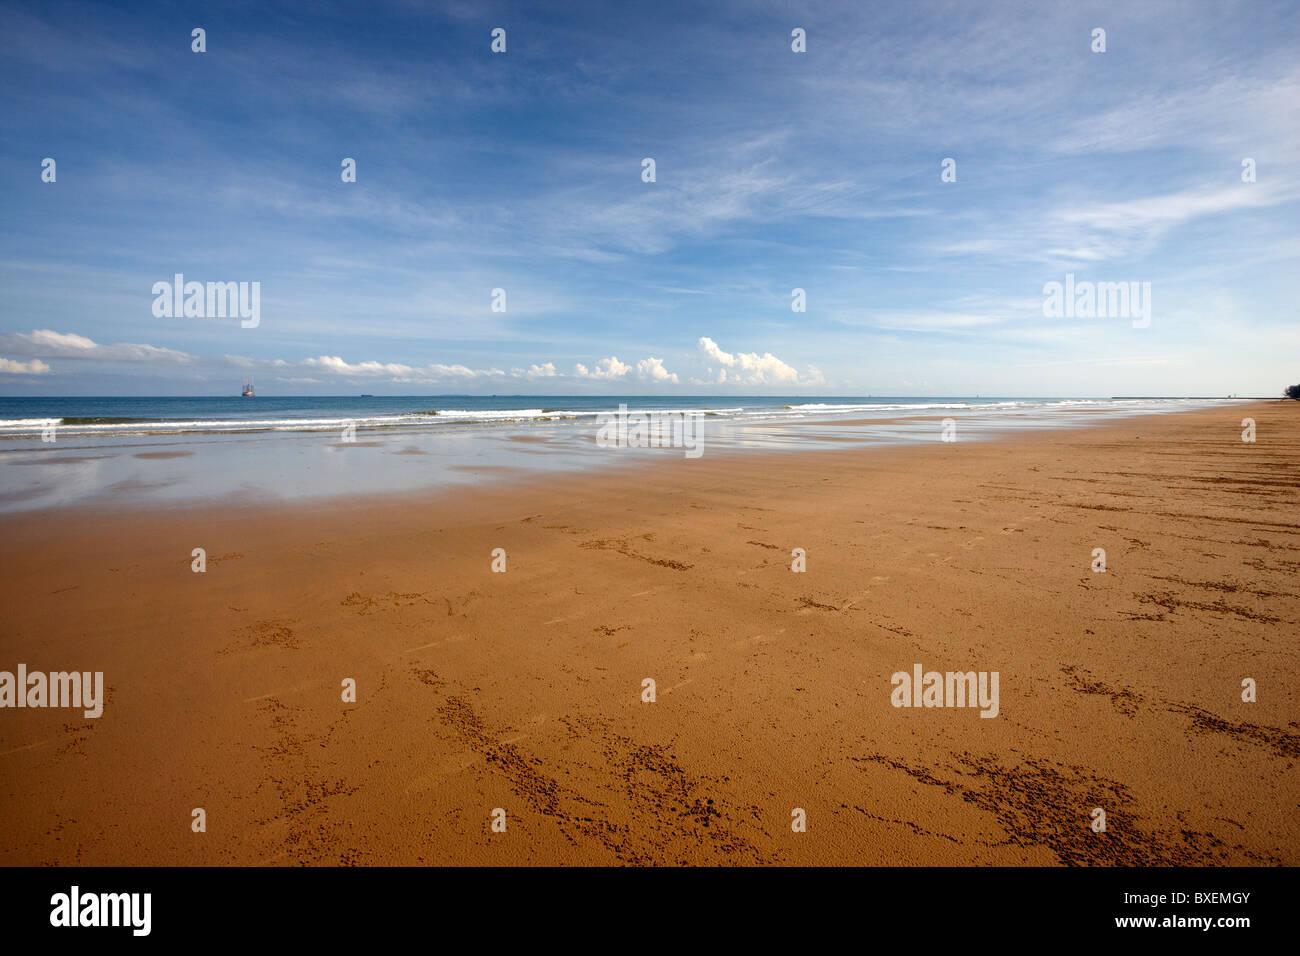 Pantai Muara beach, Muara, Brunei Darussalam, Asia - Stock Image